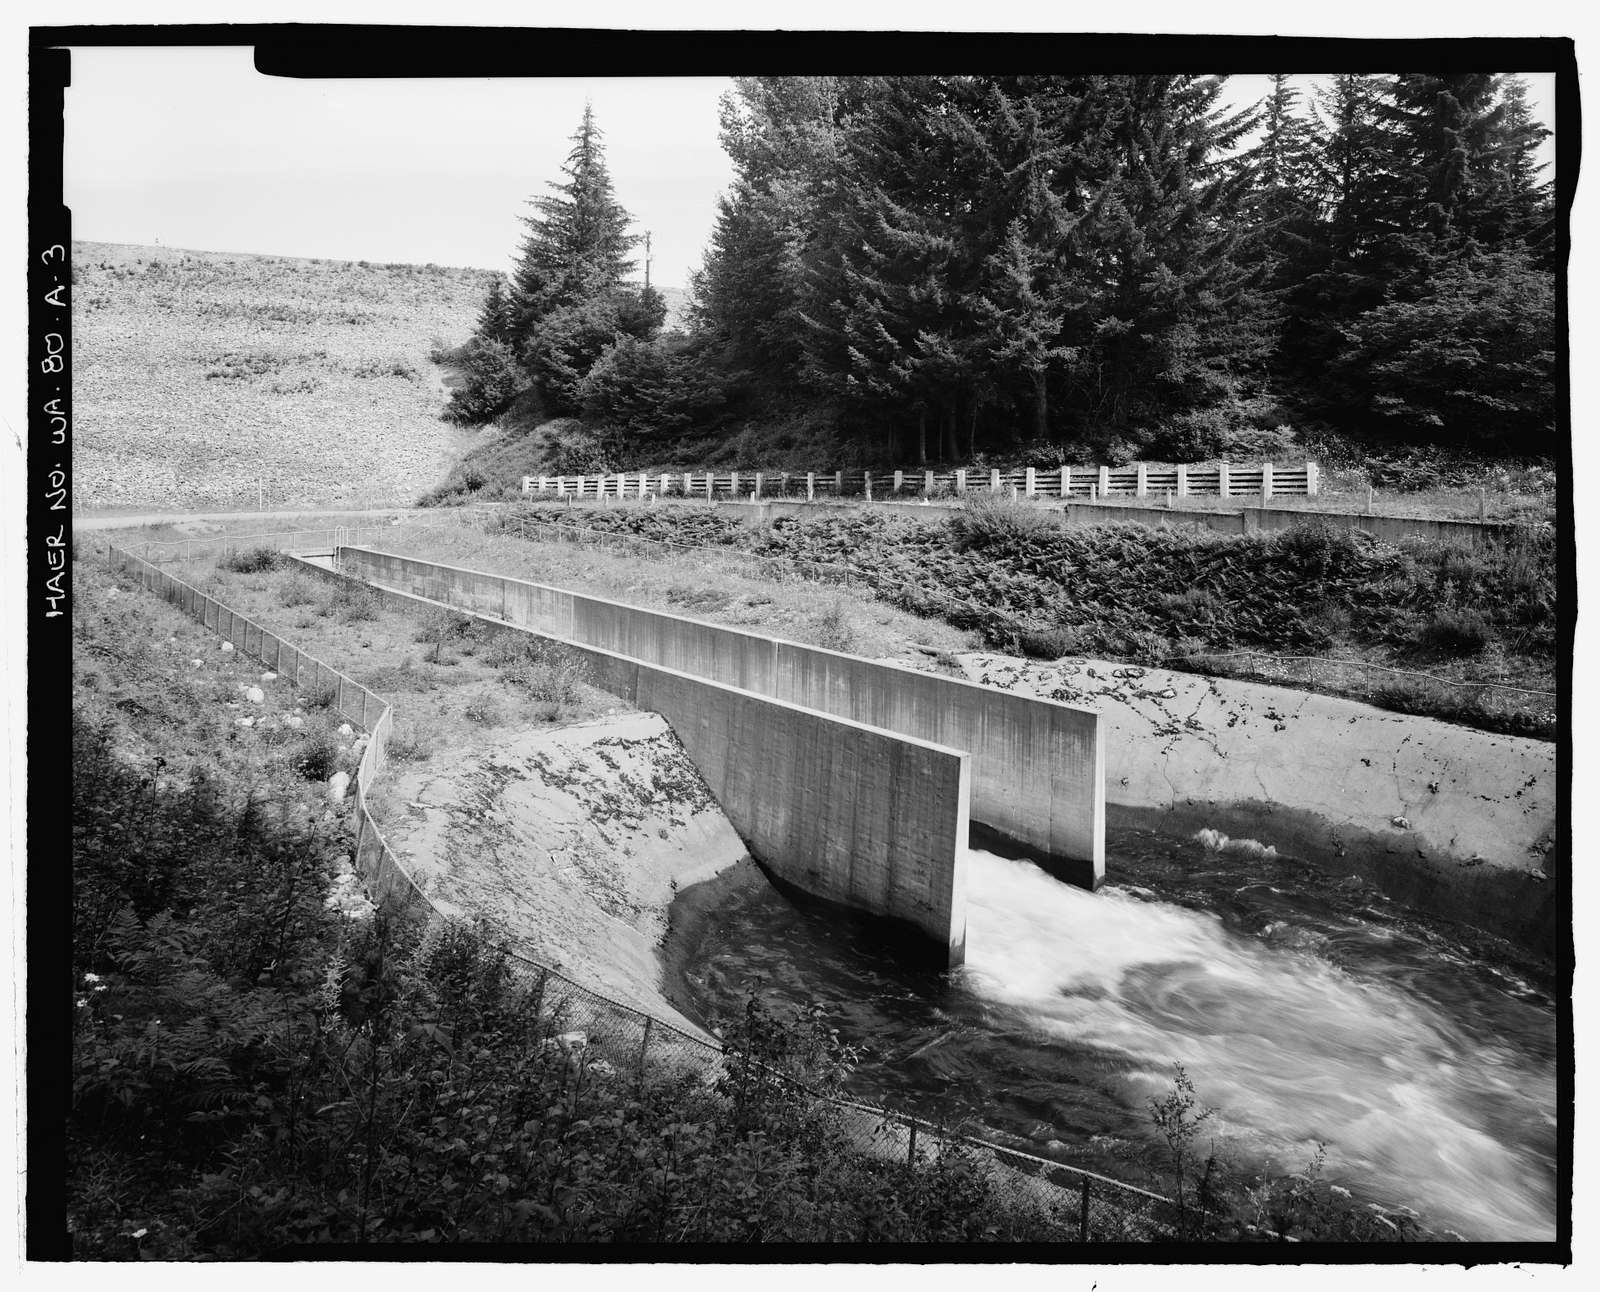 Keechelus Dam, Outlet Channel, Yakim River, 10 miles northwest of Easton, Easton, Kittitas County, WA